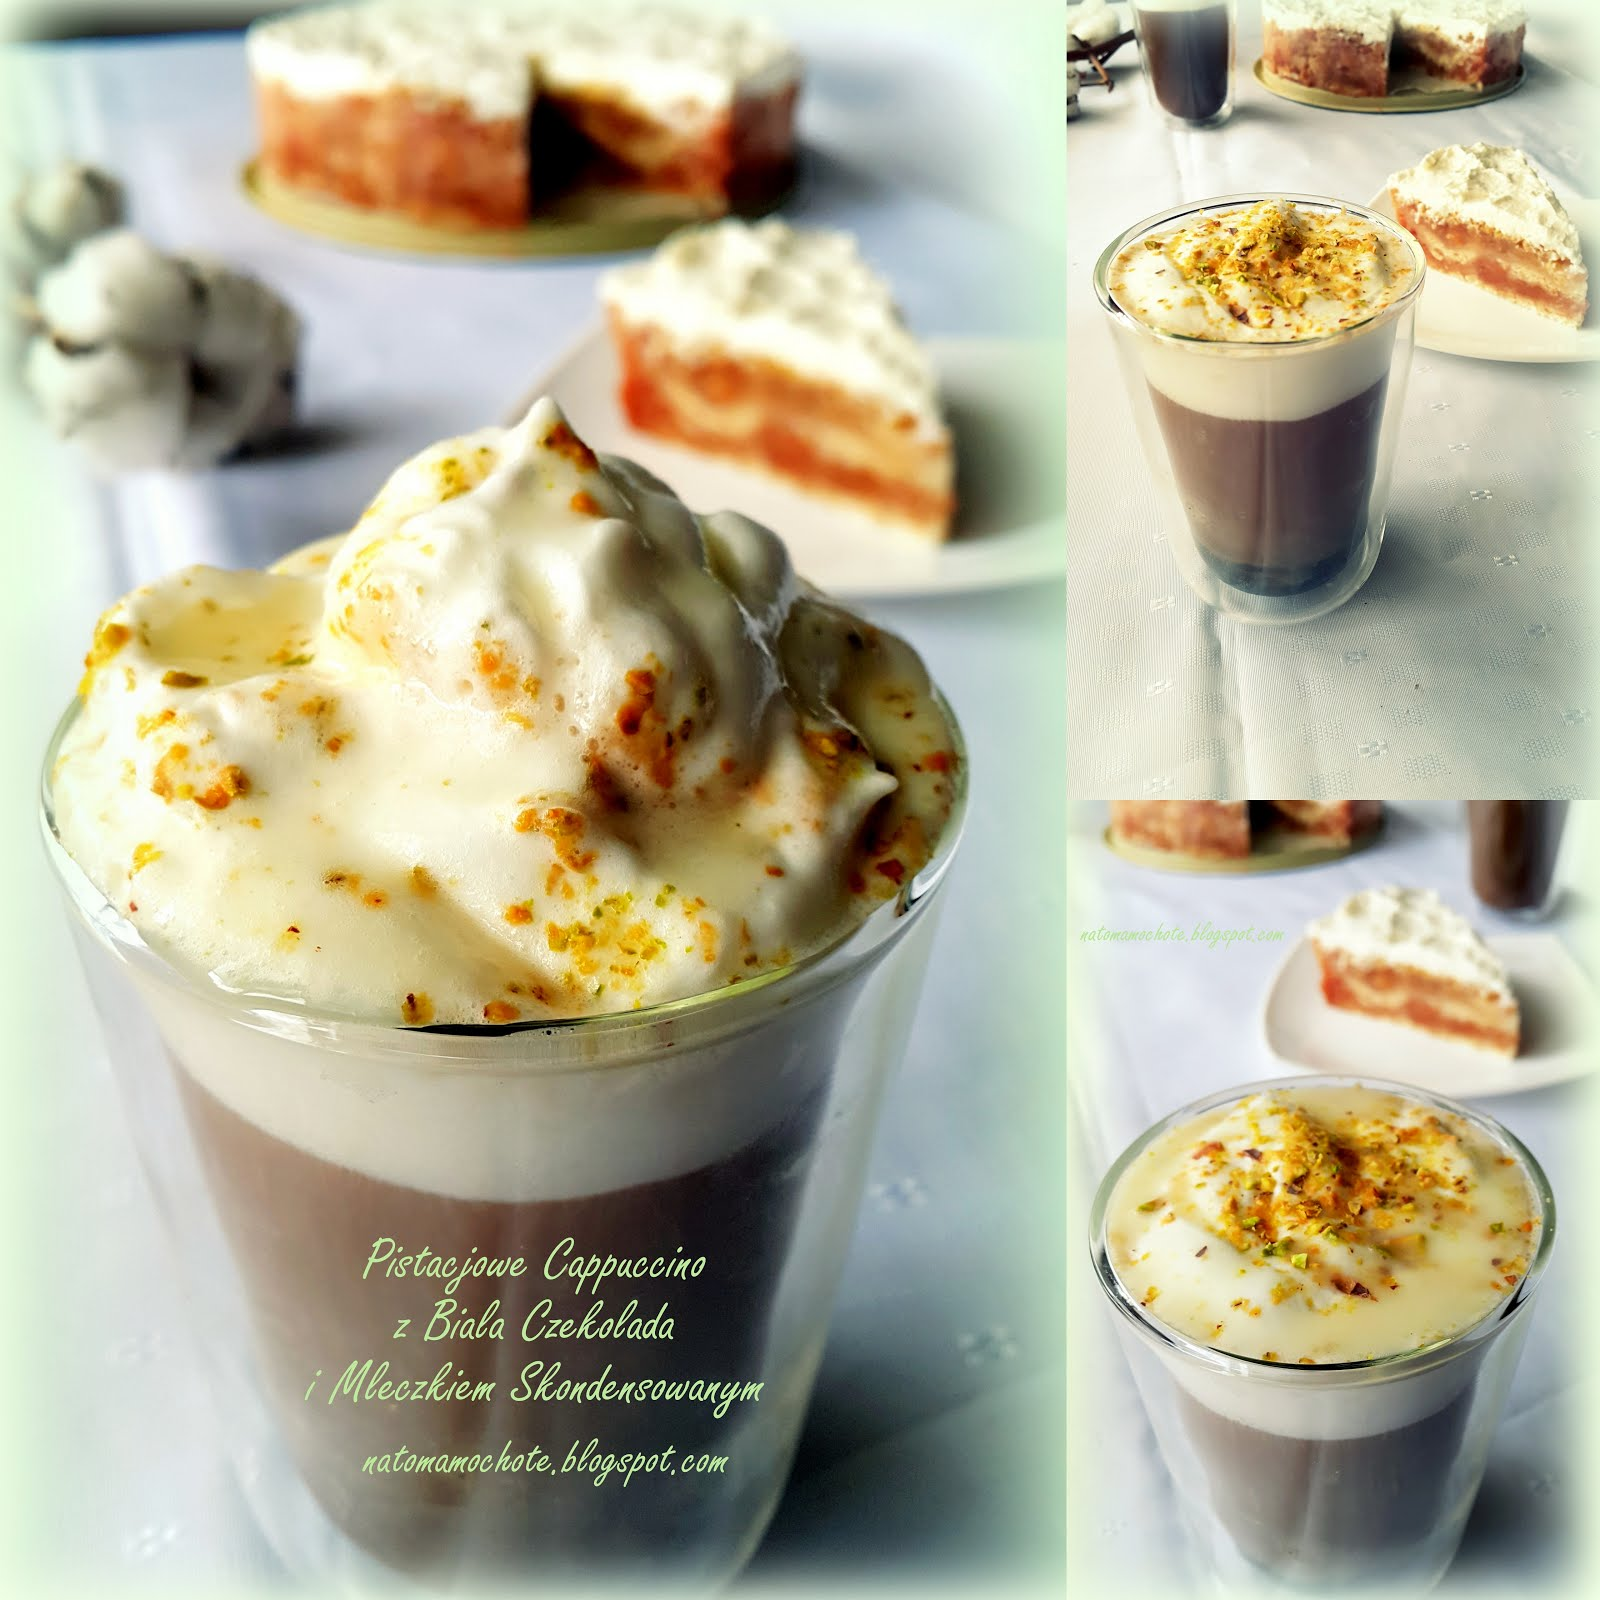 Pistacjowe Cappuccino